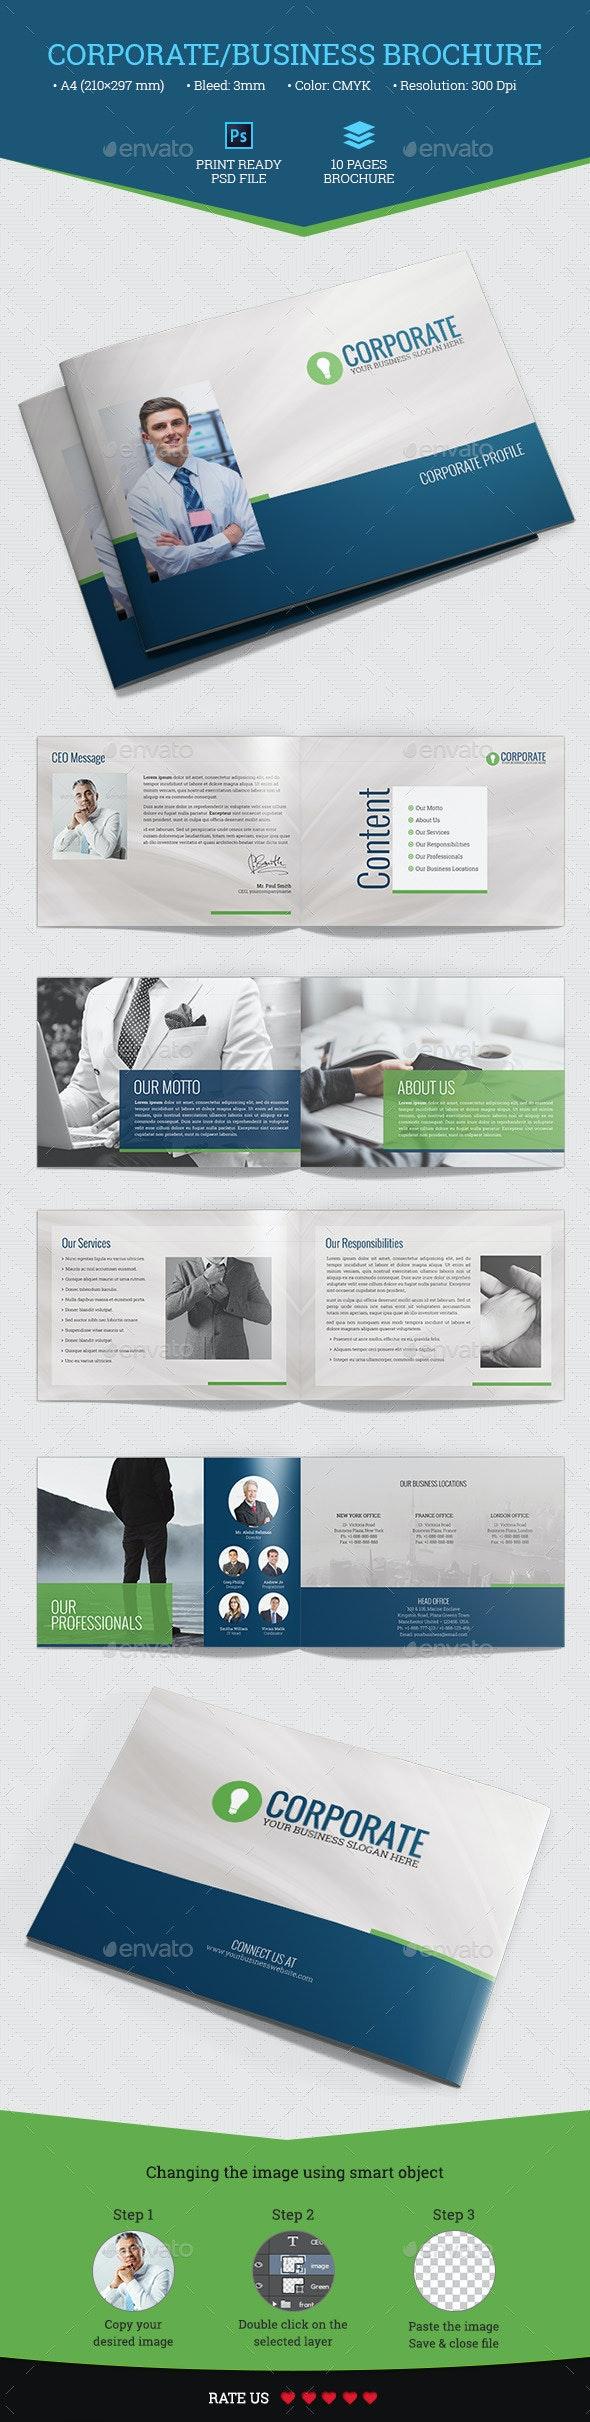 Corporate/Business Brochure - Corporate Brochures